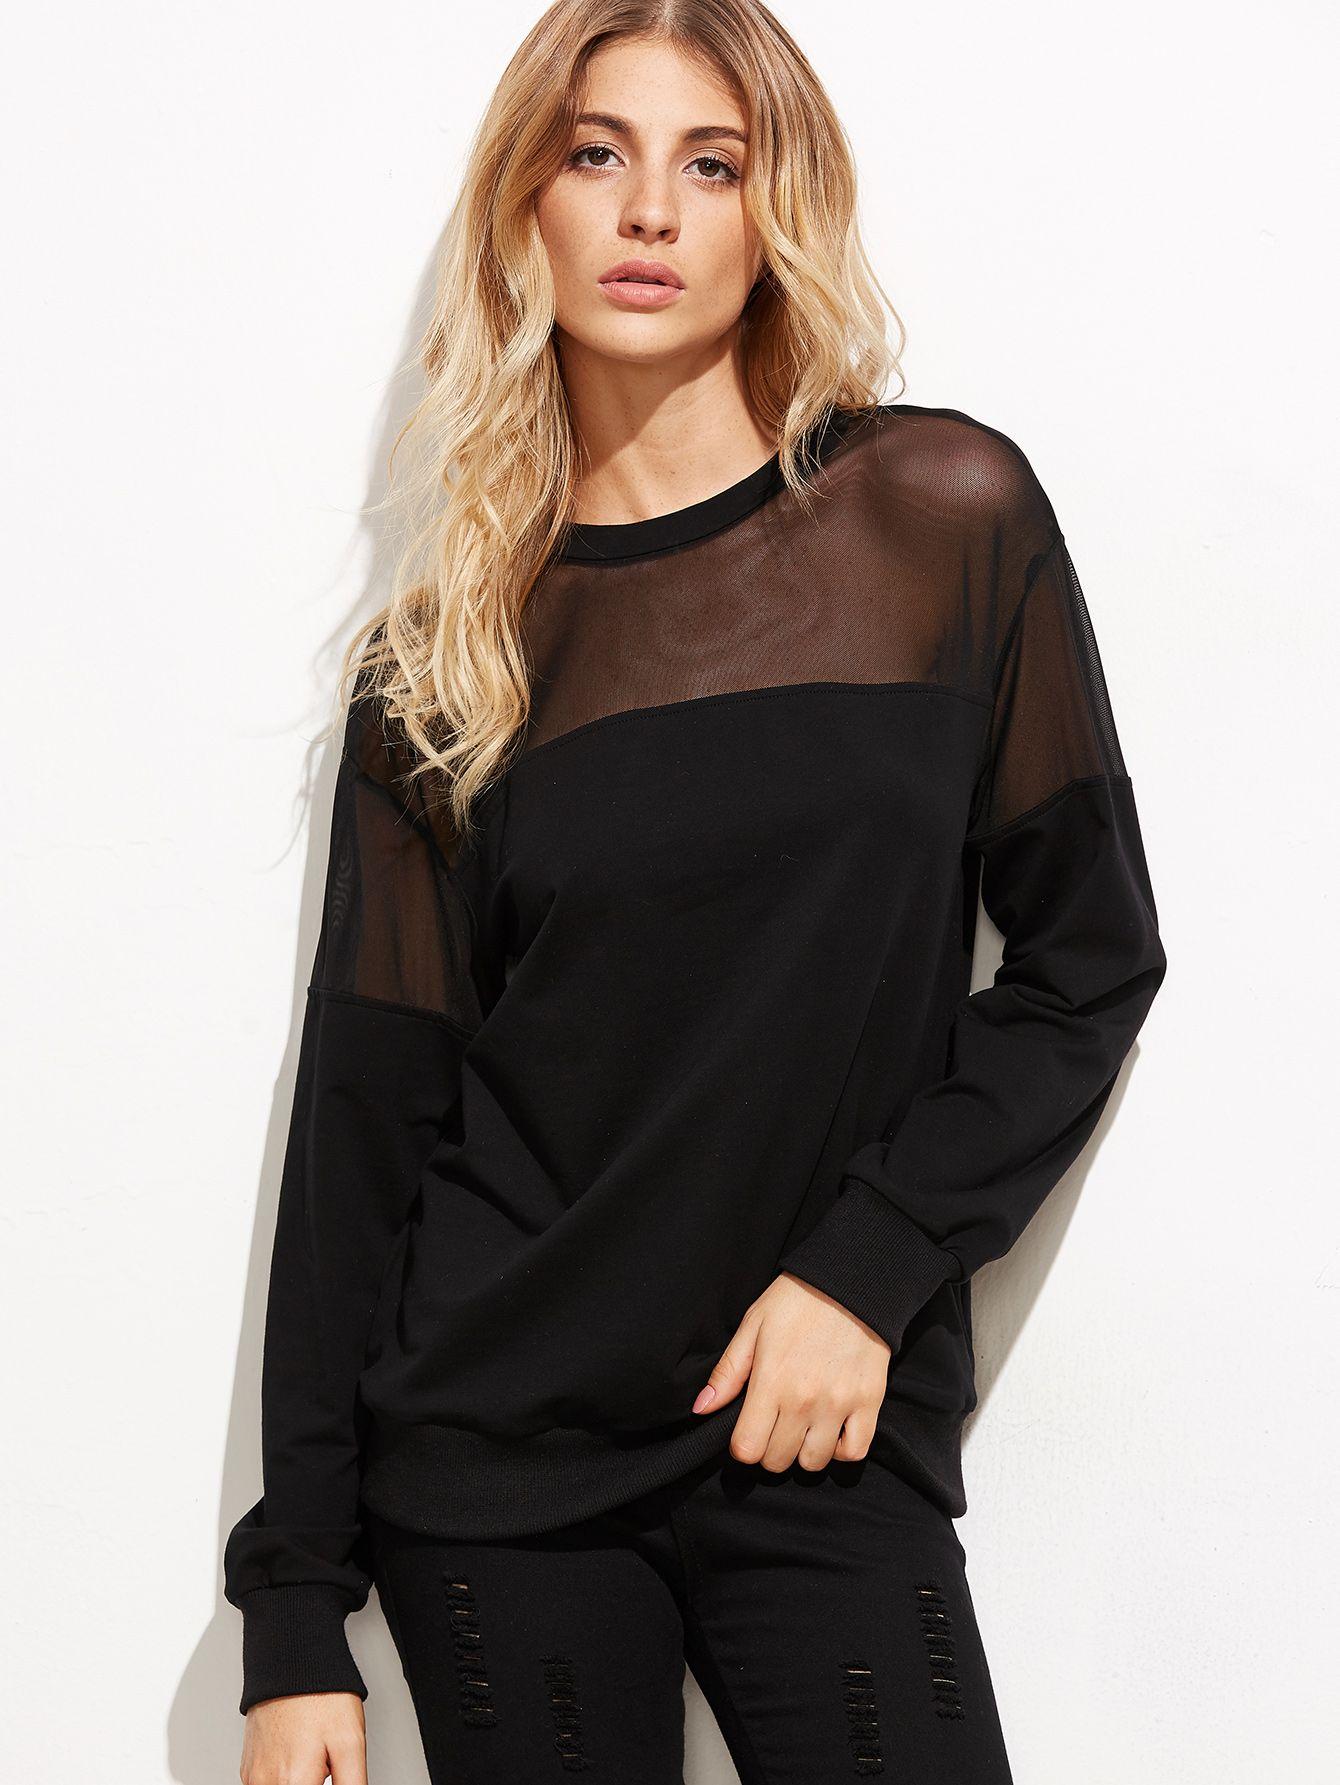 618c0b7d96 Shop Black Mesh Insert Sweatshirt online. SheIn offers Black Mesh Insert  Sweatshirt & more to fit your fashionable needs.